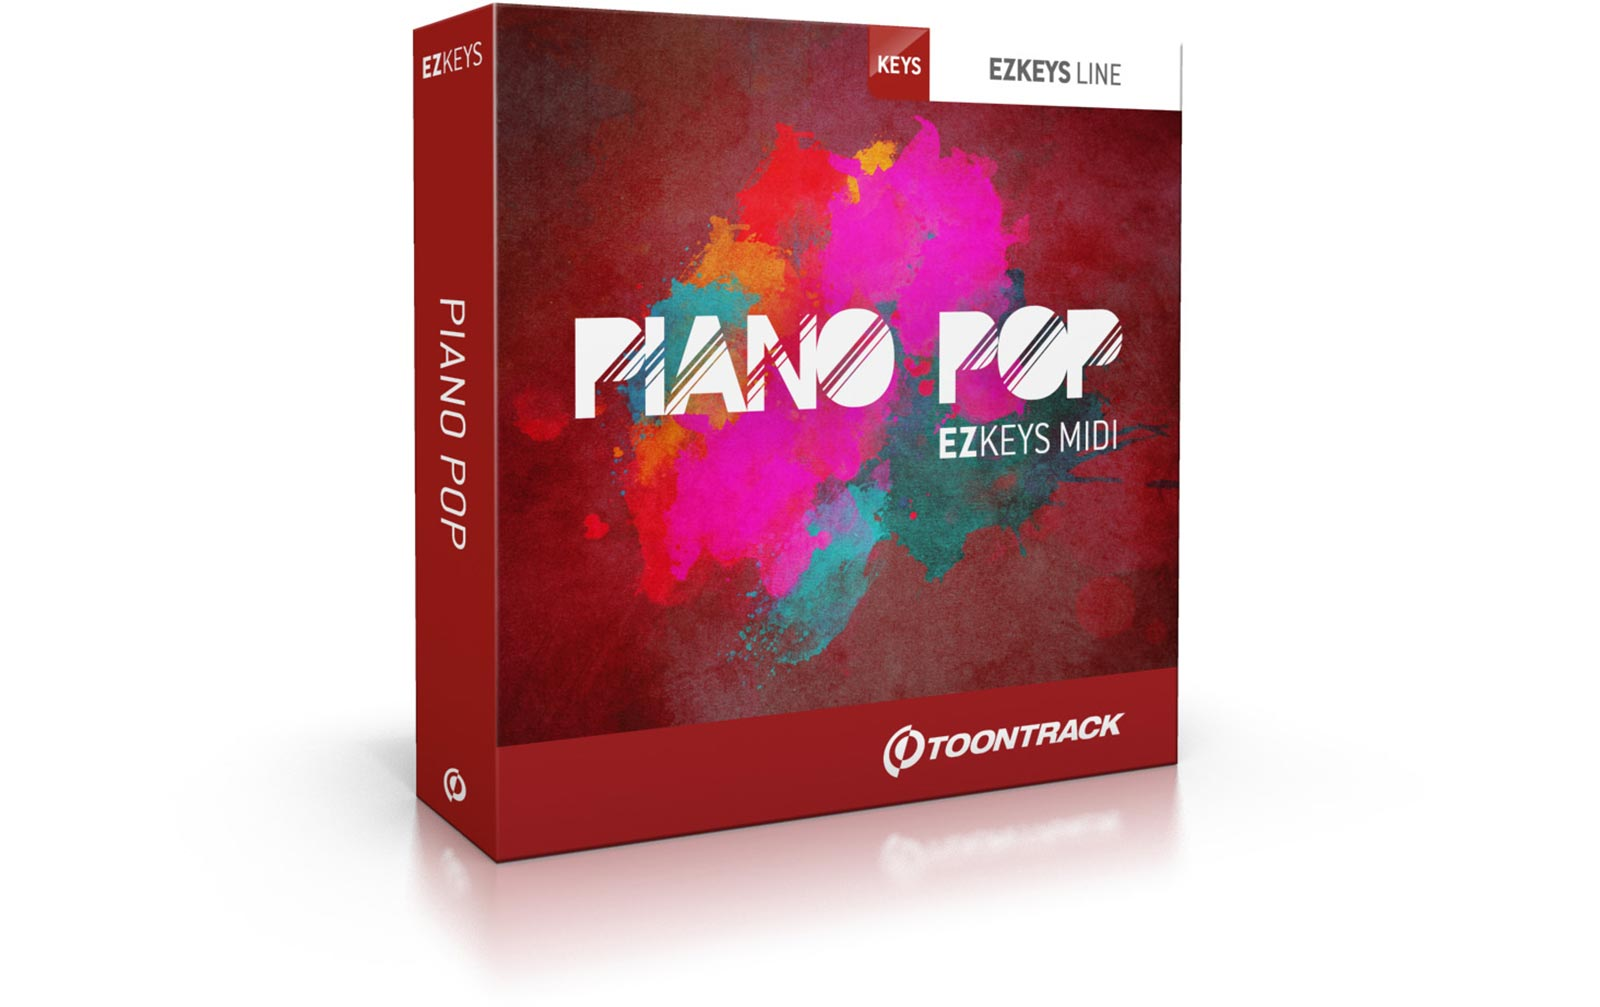 toontrack-ezkeys-piano-pop-midi-pack-download-